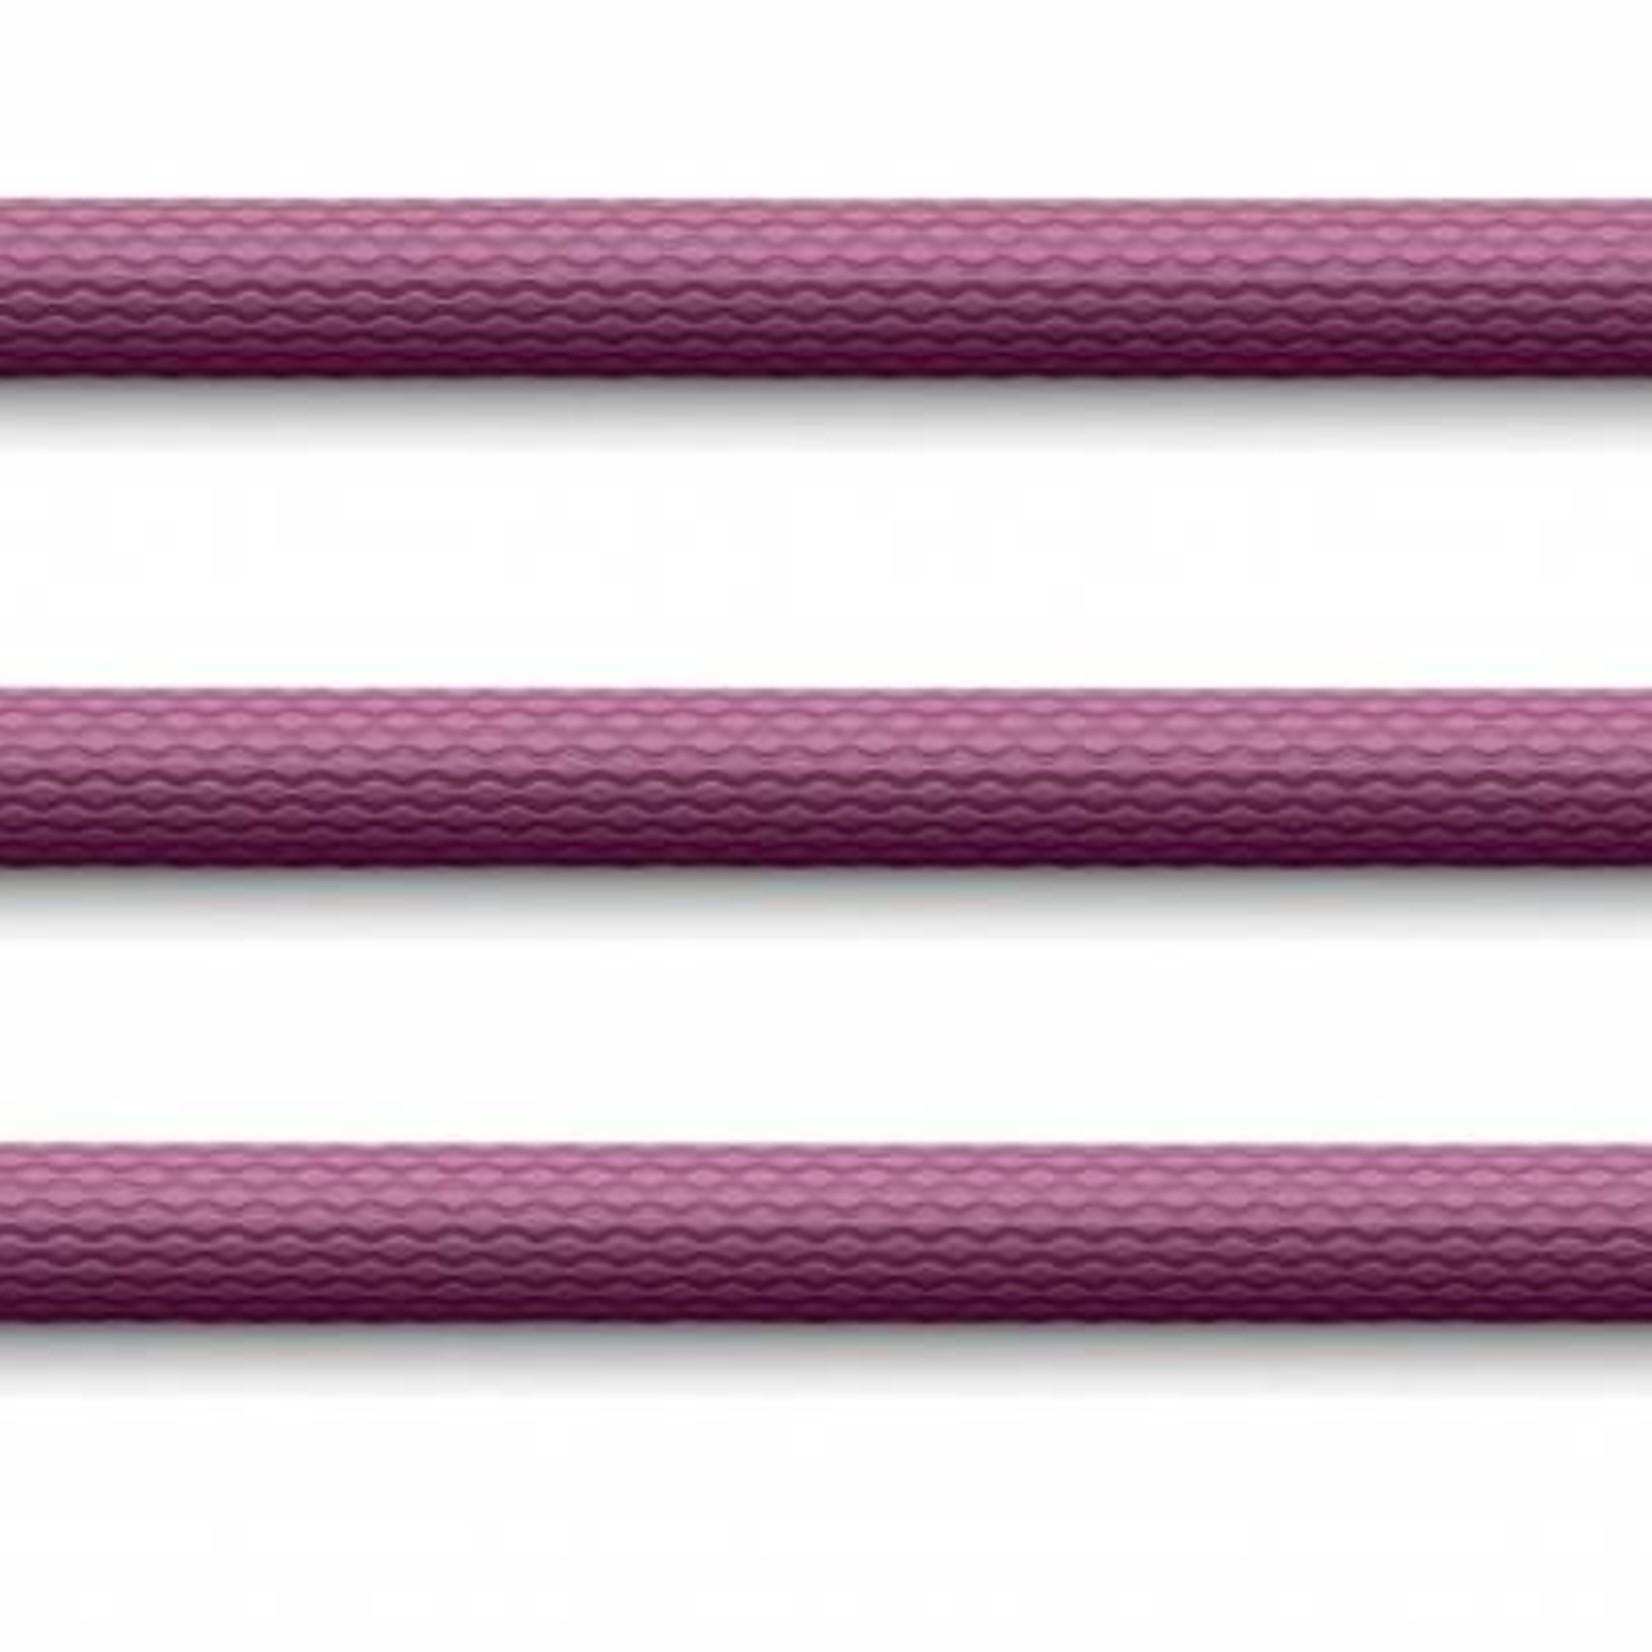 Faber-Castell Bleistifte Farbwelten Guilloche Electric Pink 3Stk